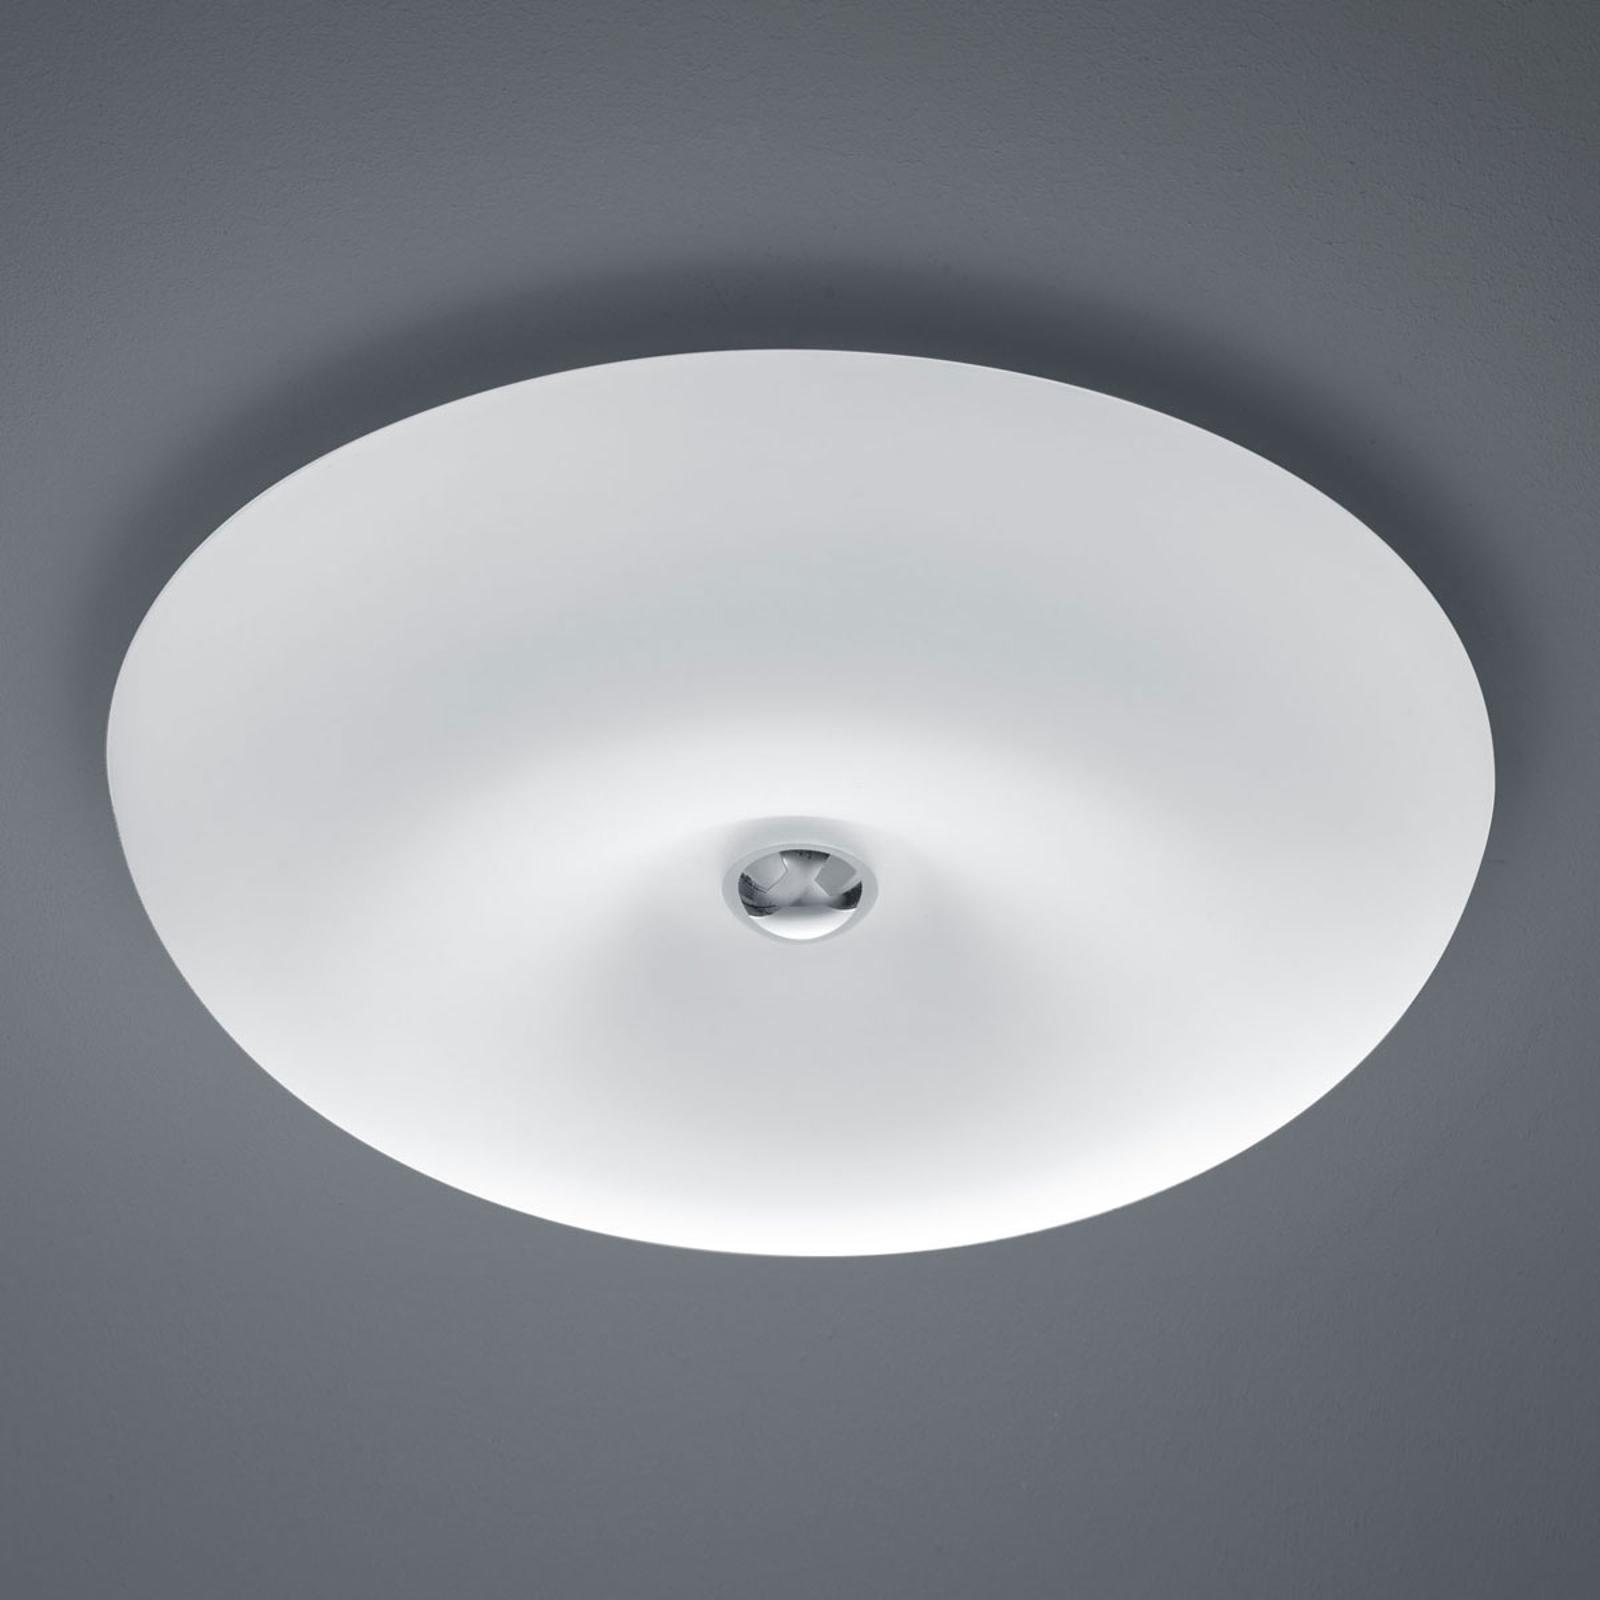 BANKAMP Vanity LED-loftlampe, glas, nikkel